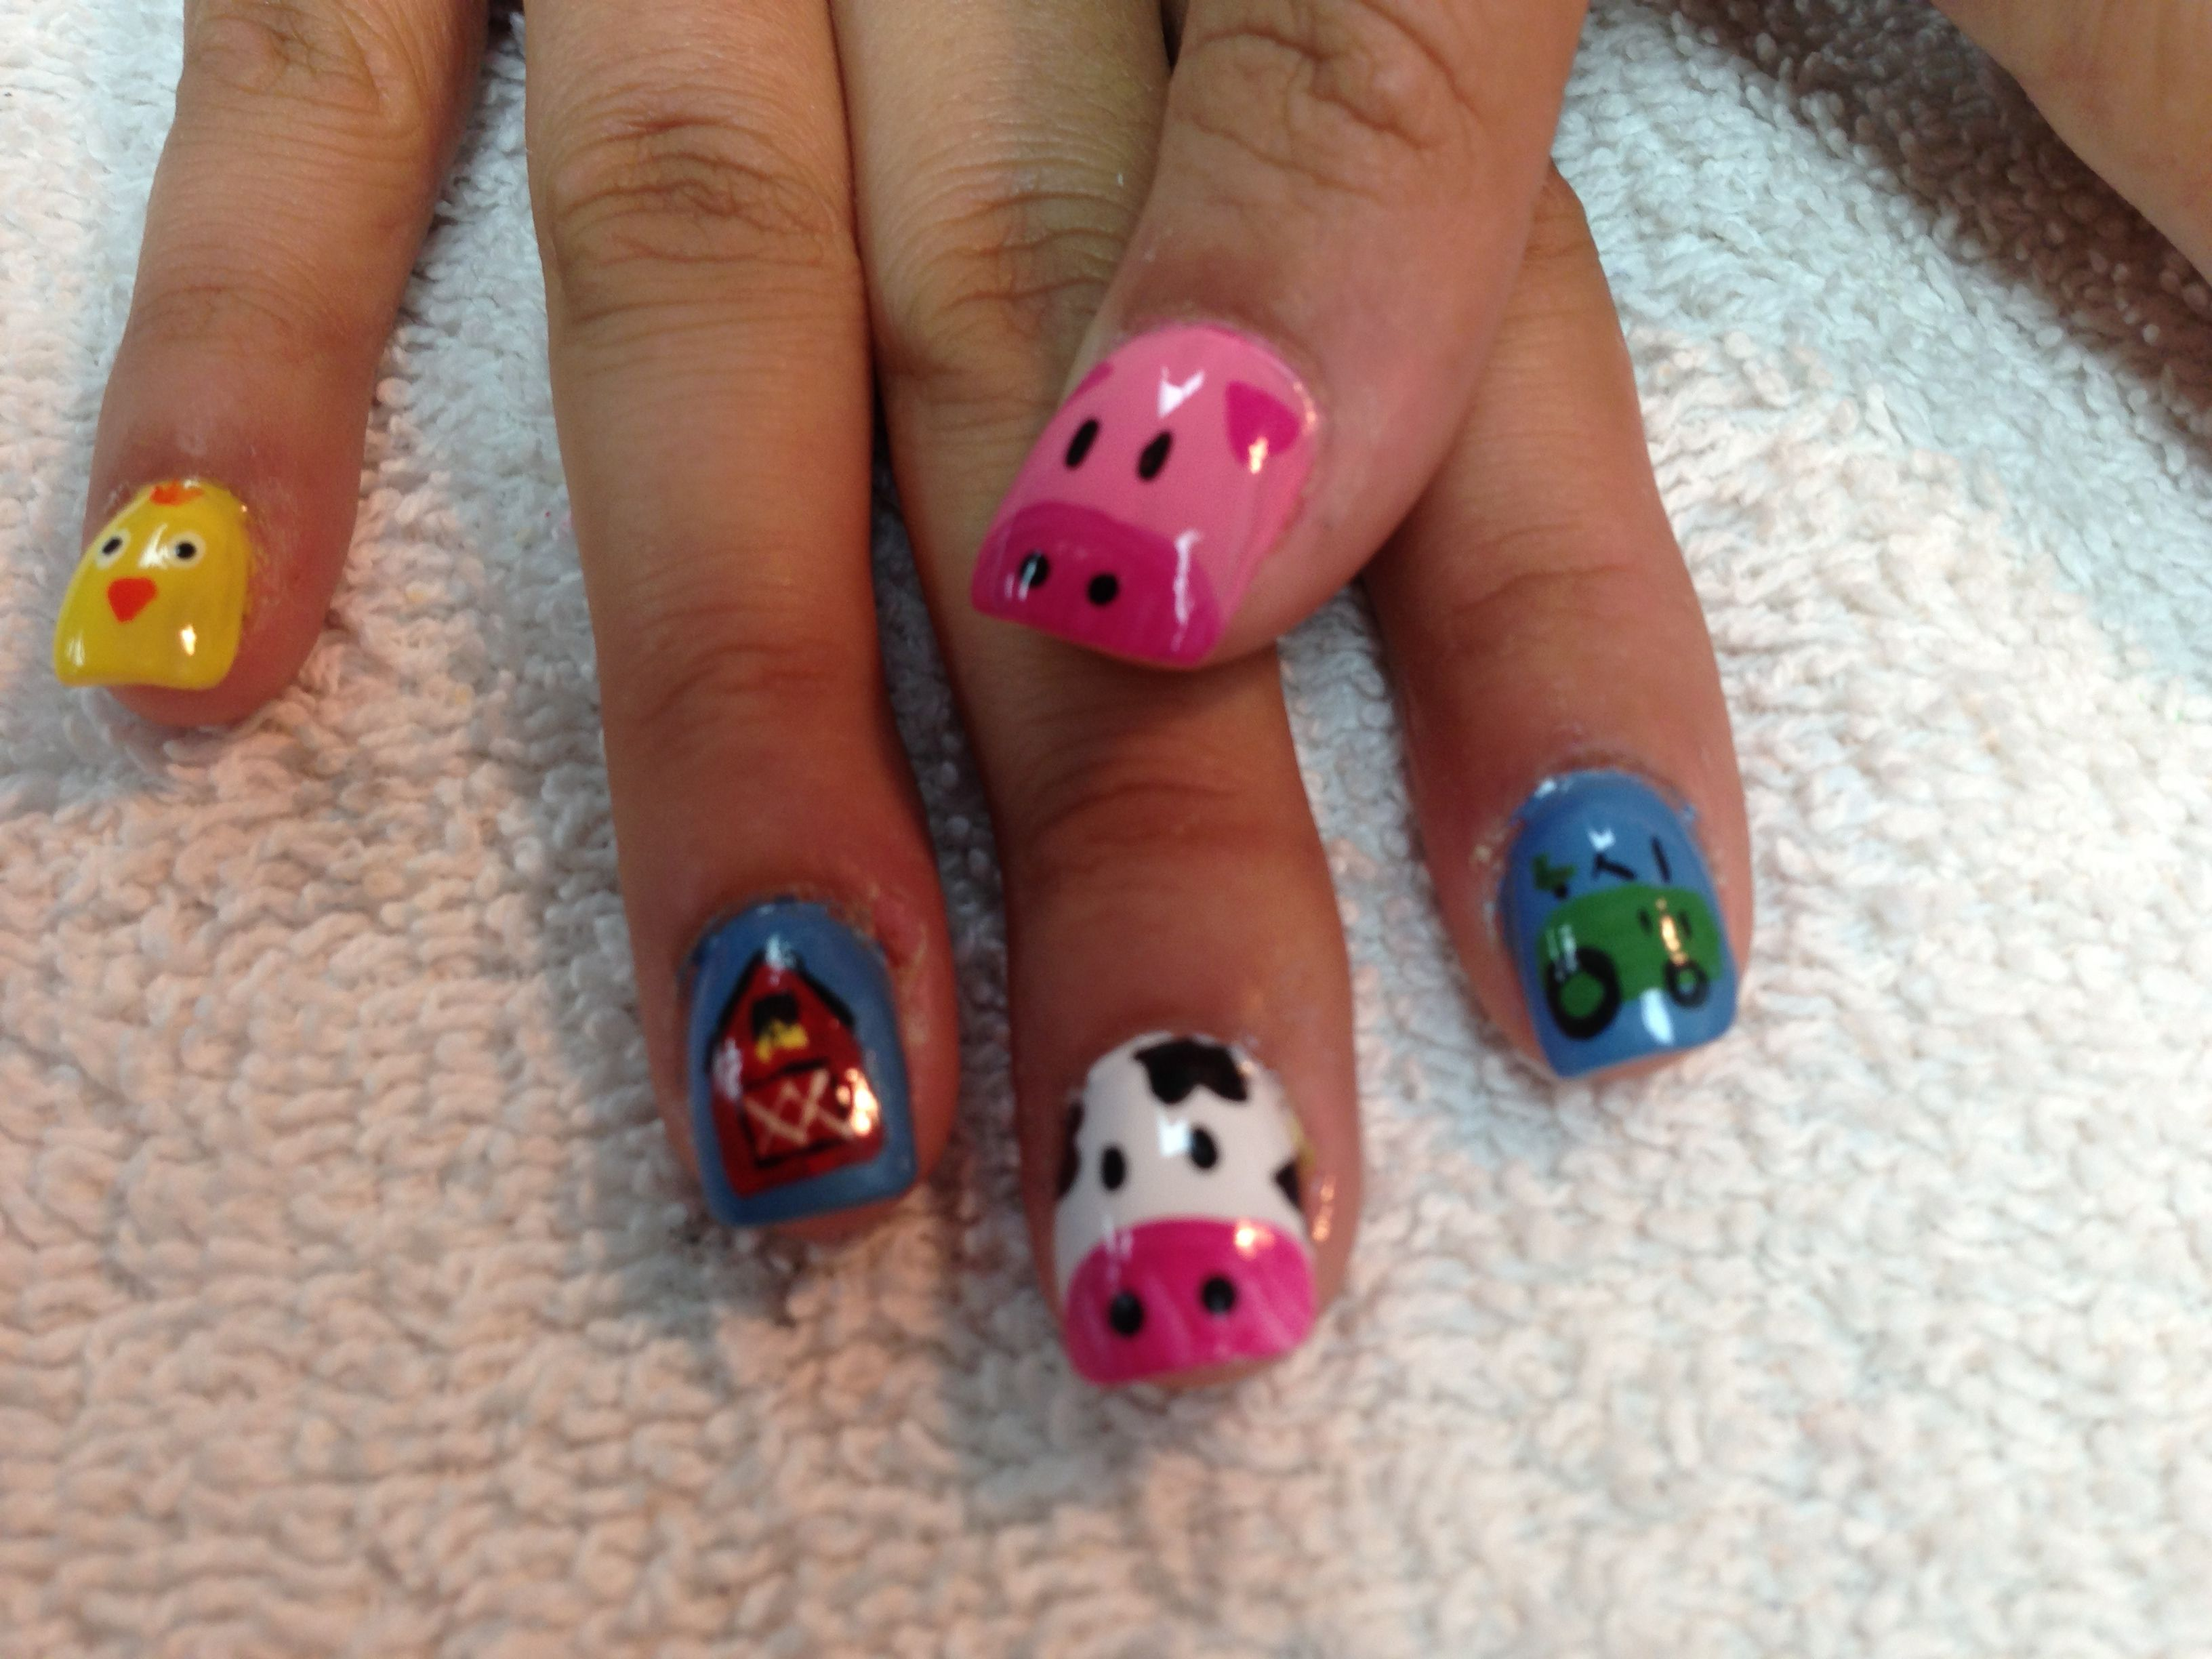 Farm animal nails | My nails | Pinterest | Farm animal nails ...